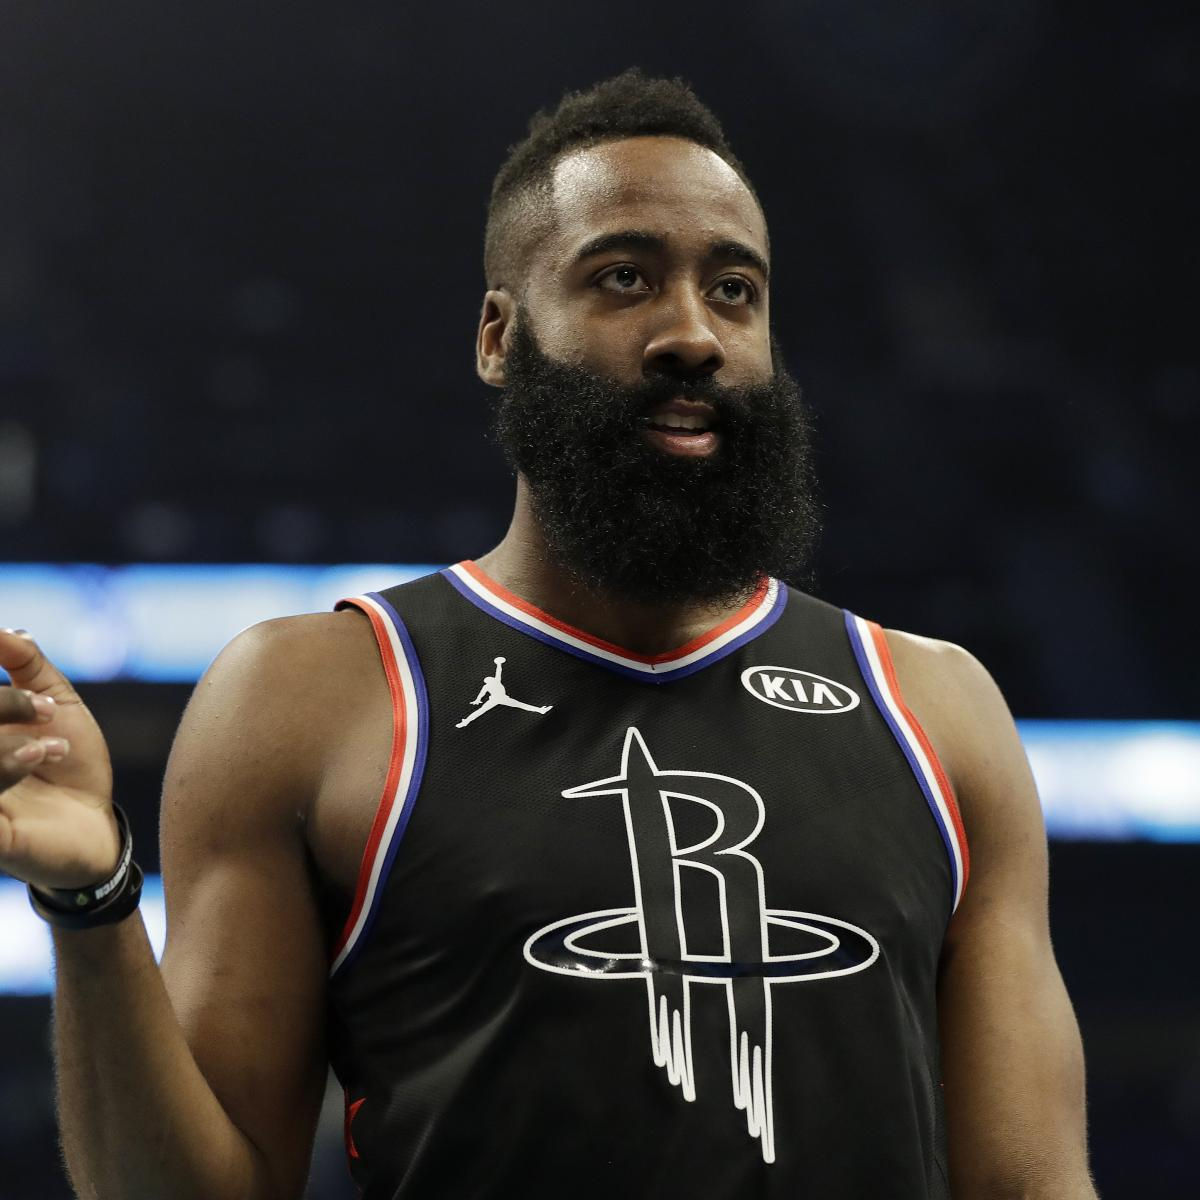 James Harden Records 2019: Windhorst: James Harden 'Sensitive' To Certain NBA Players